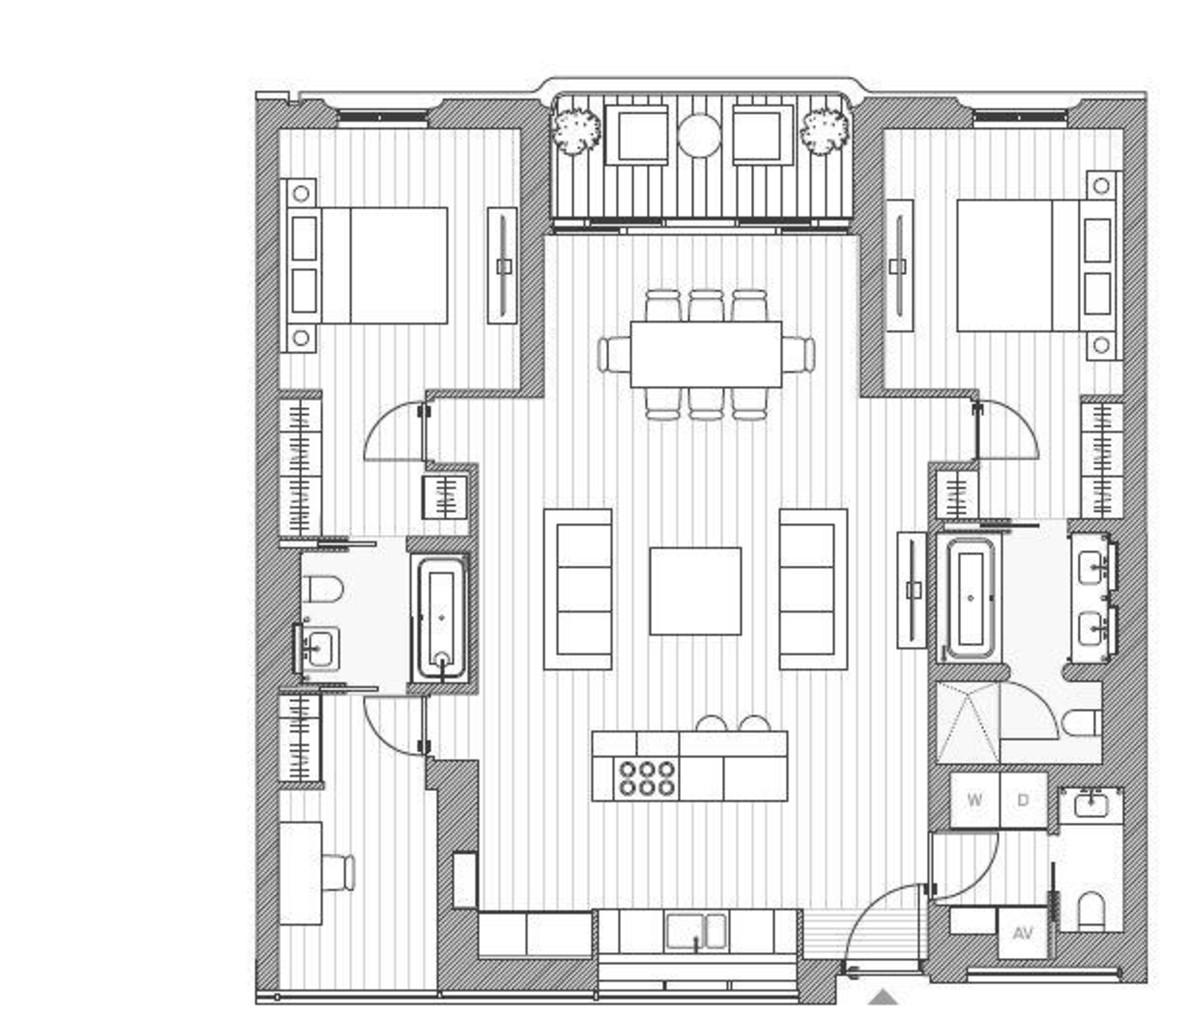 2 bed flat for sale in Moxon Street, Marylebone - Property Floorplan